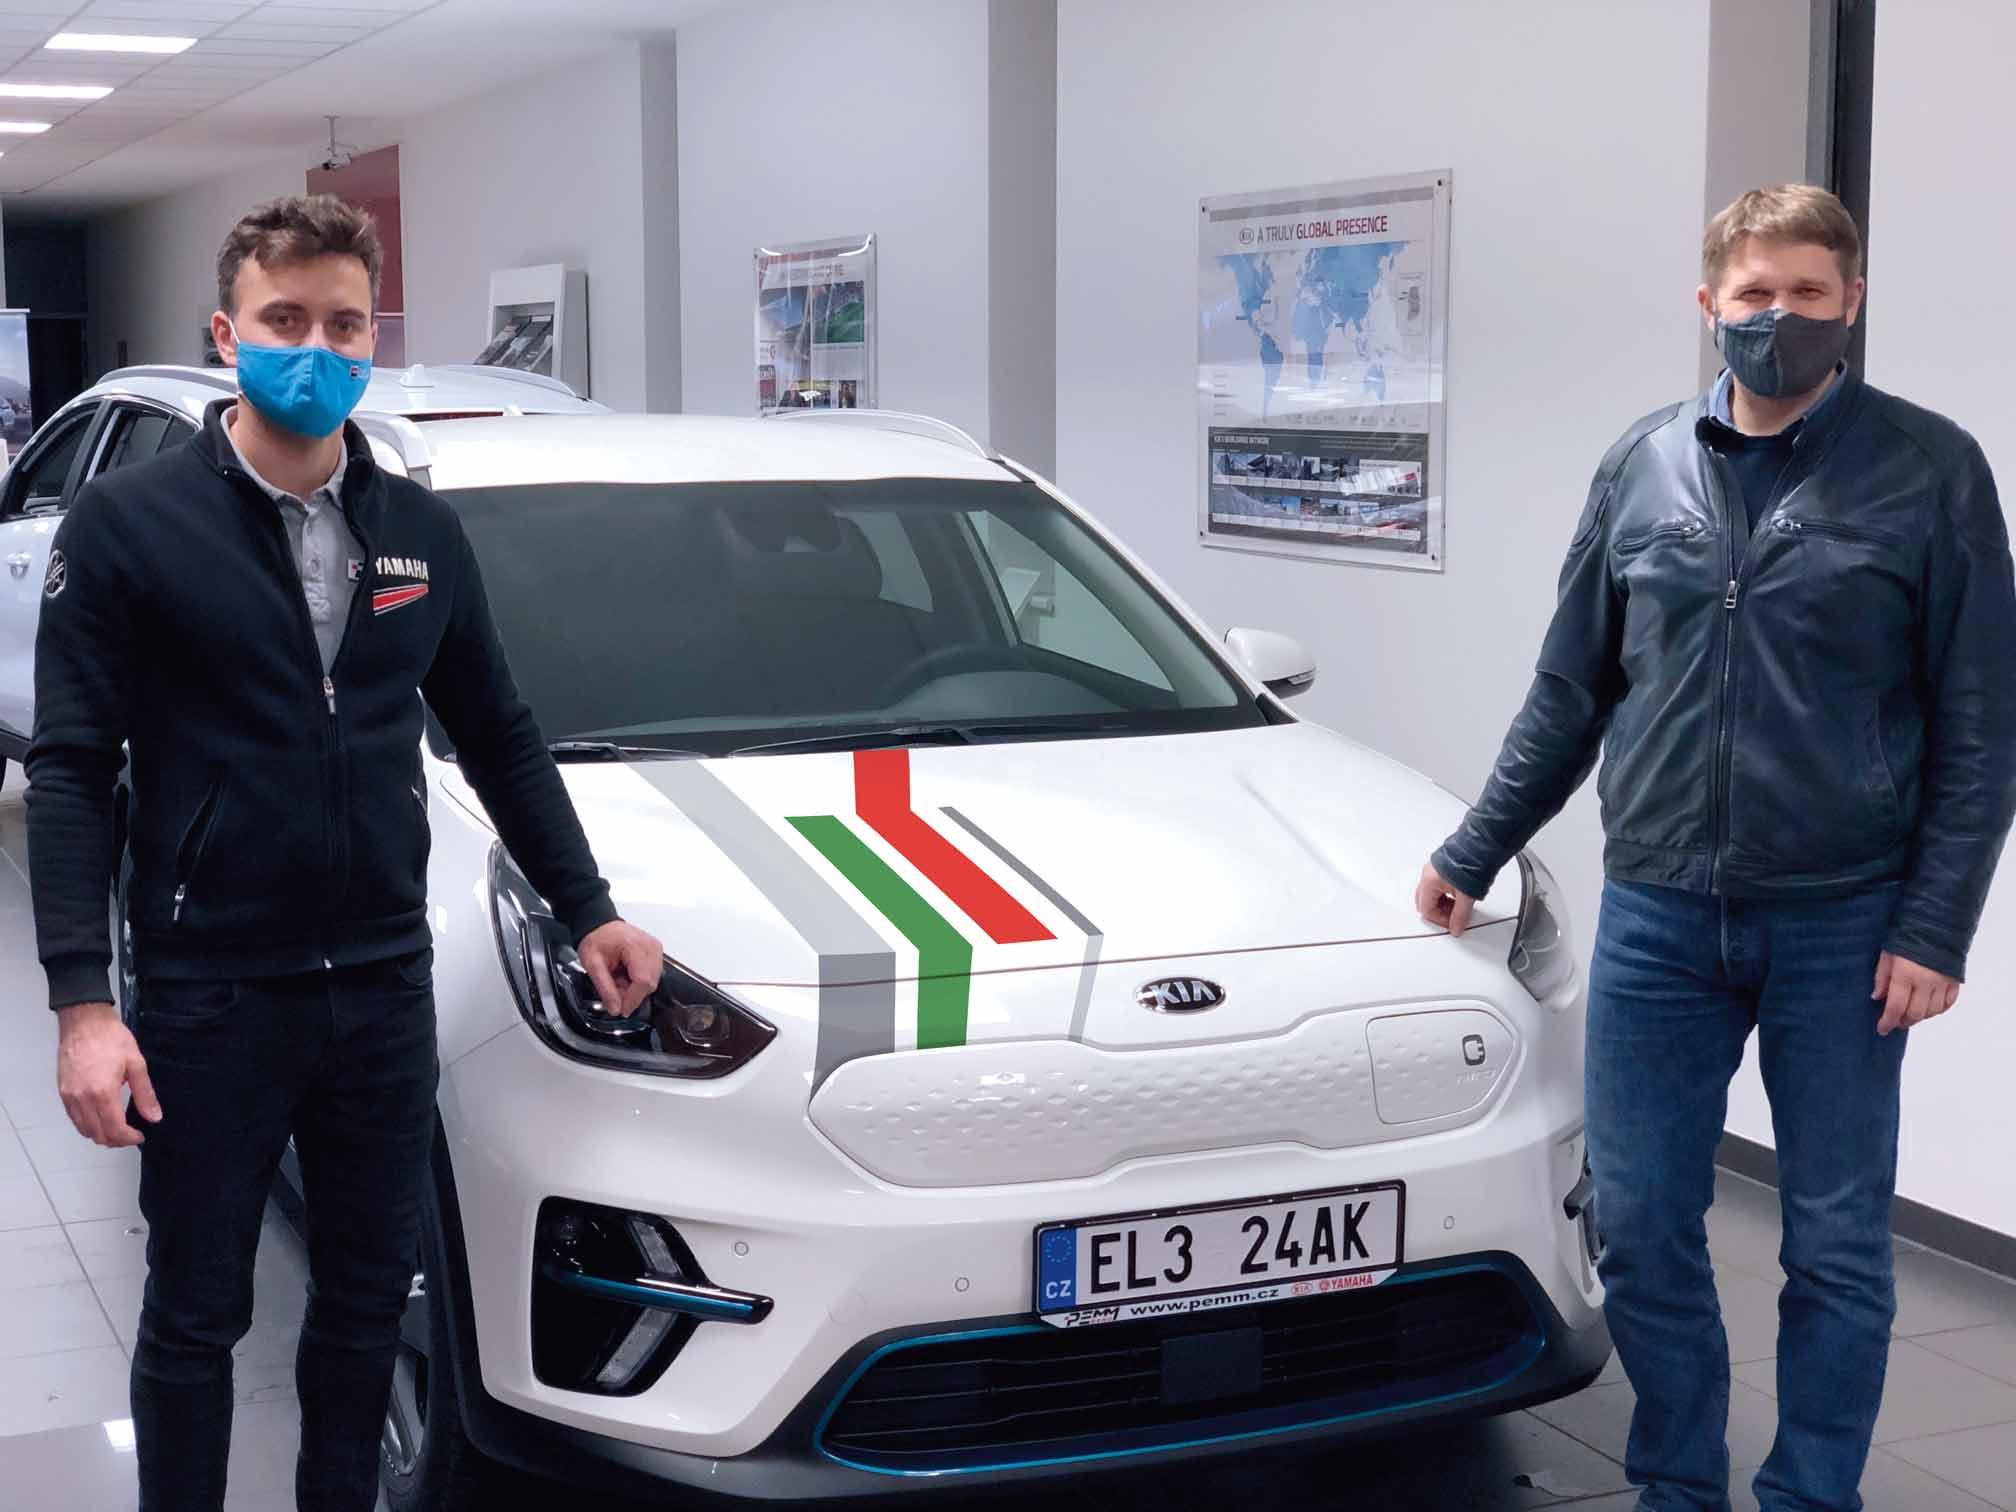 Pan Soukup ze společnosti PEMM Brno s.r.o. předává panu Knettigovi elektromobil KIA.